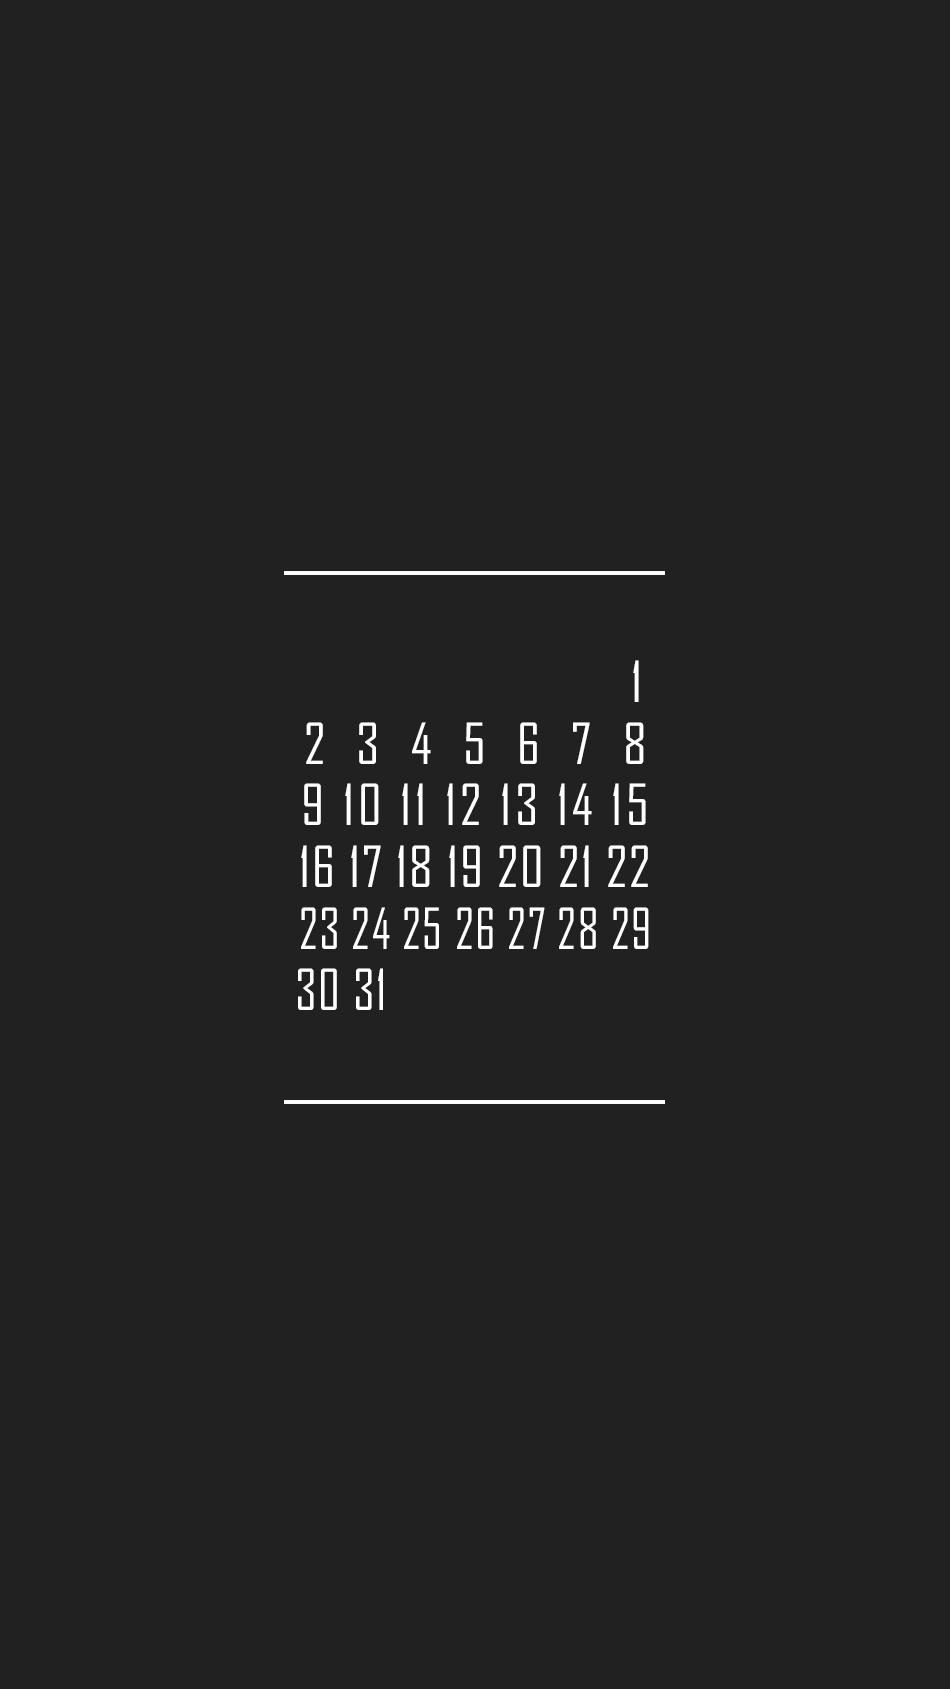 календарь на август 12 district-f.org